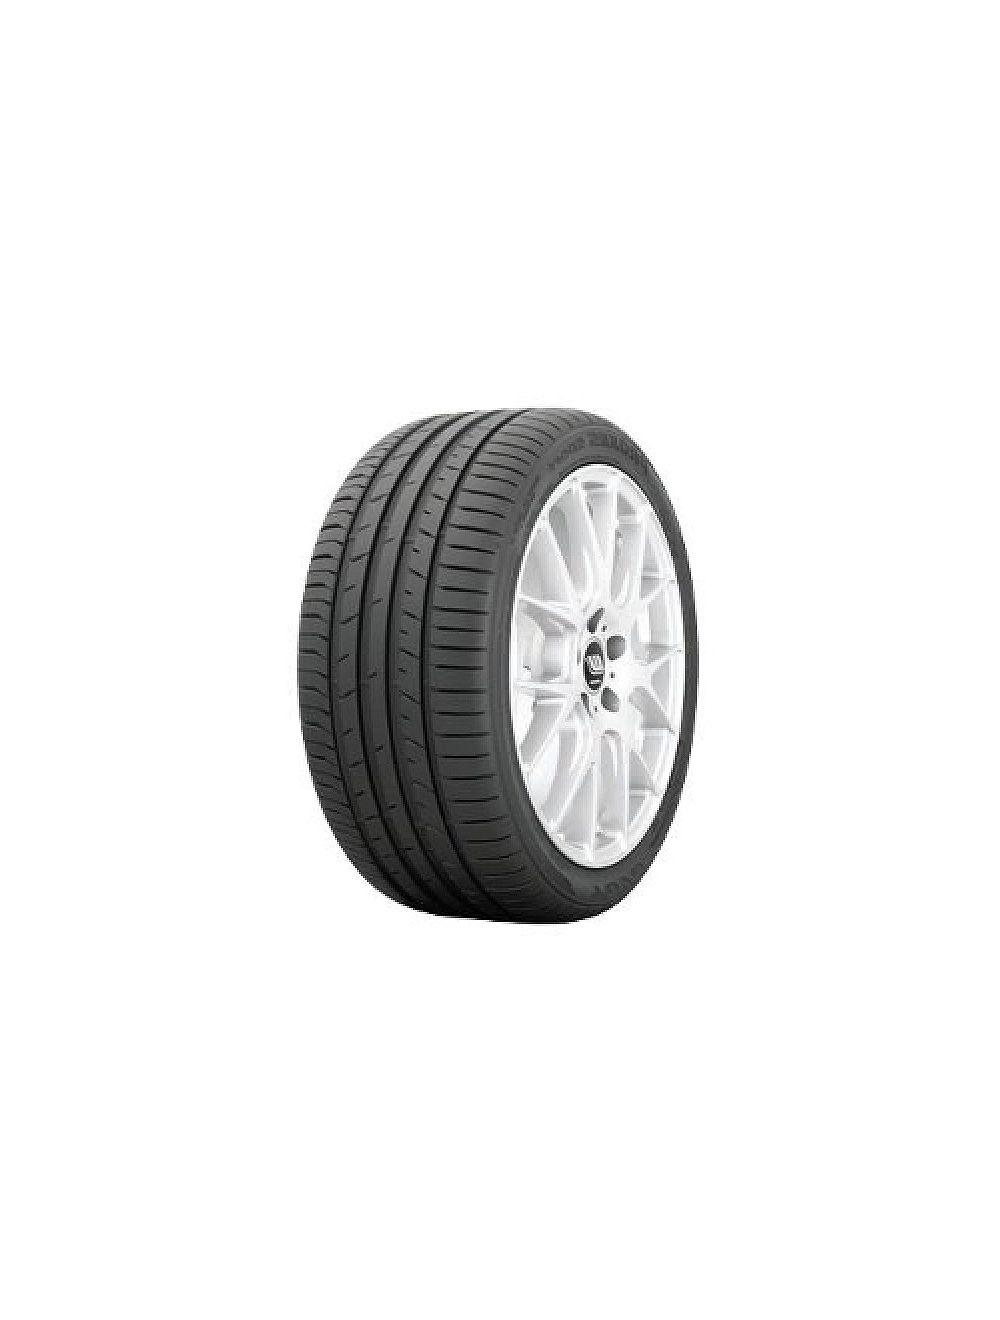 Toyo 255/30R19 Y Proxes Sport XL Nyári gumi